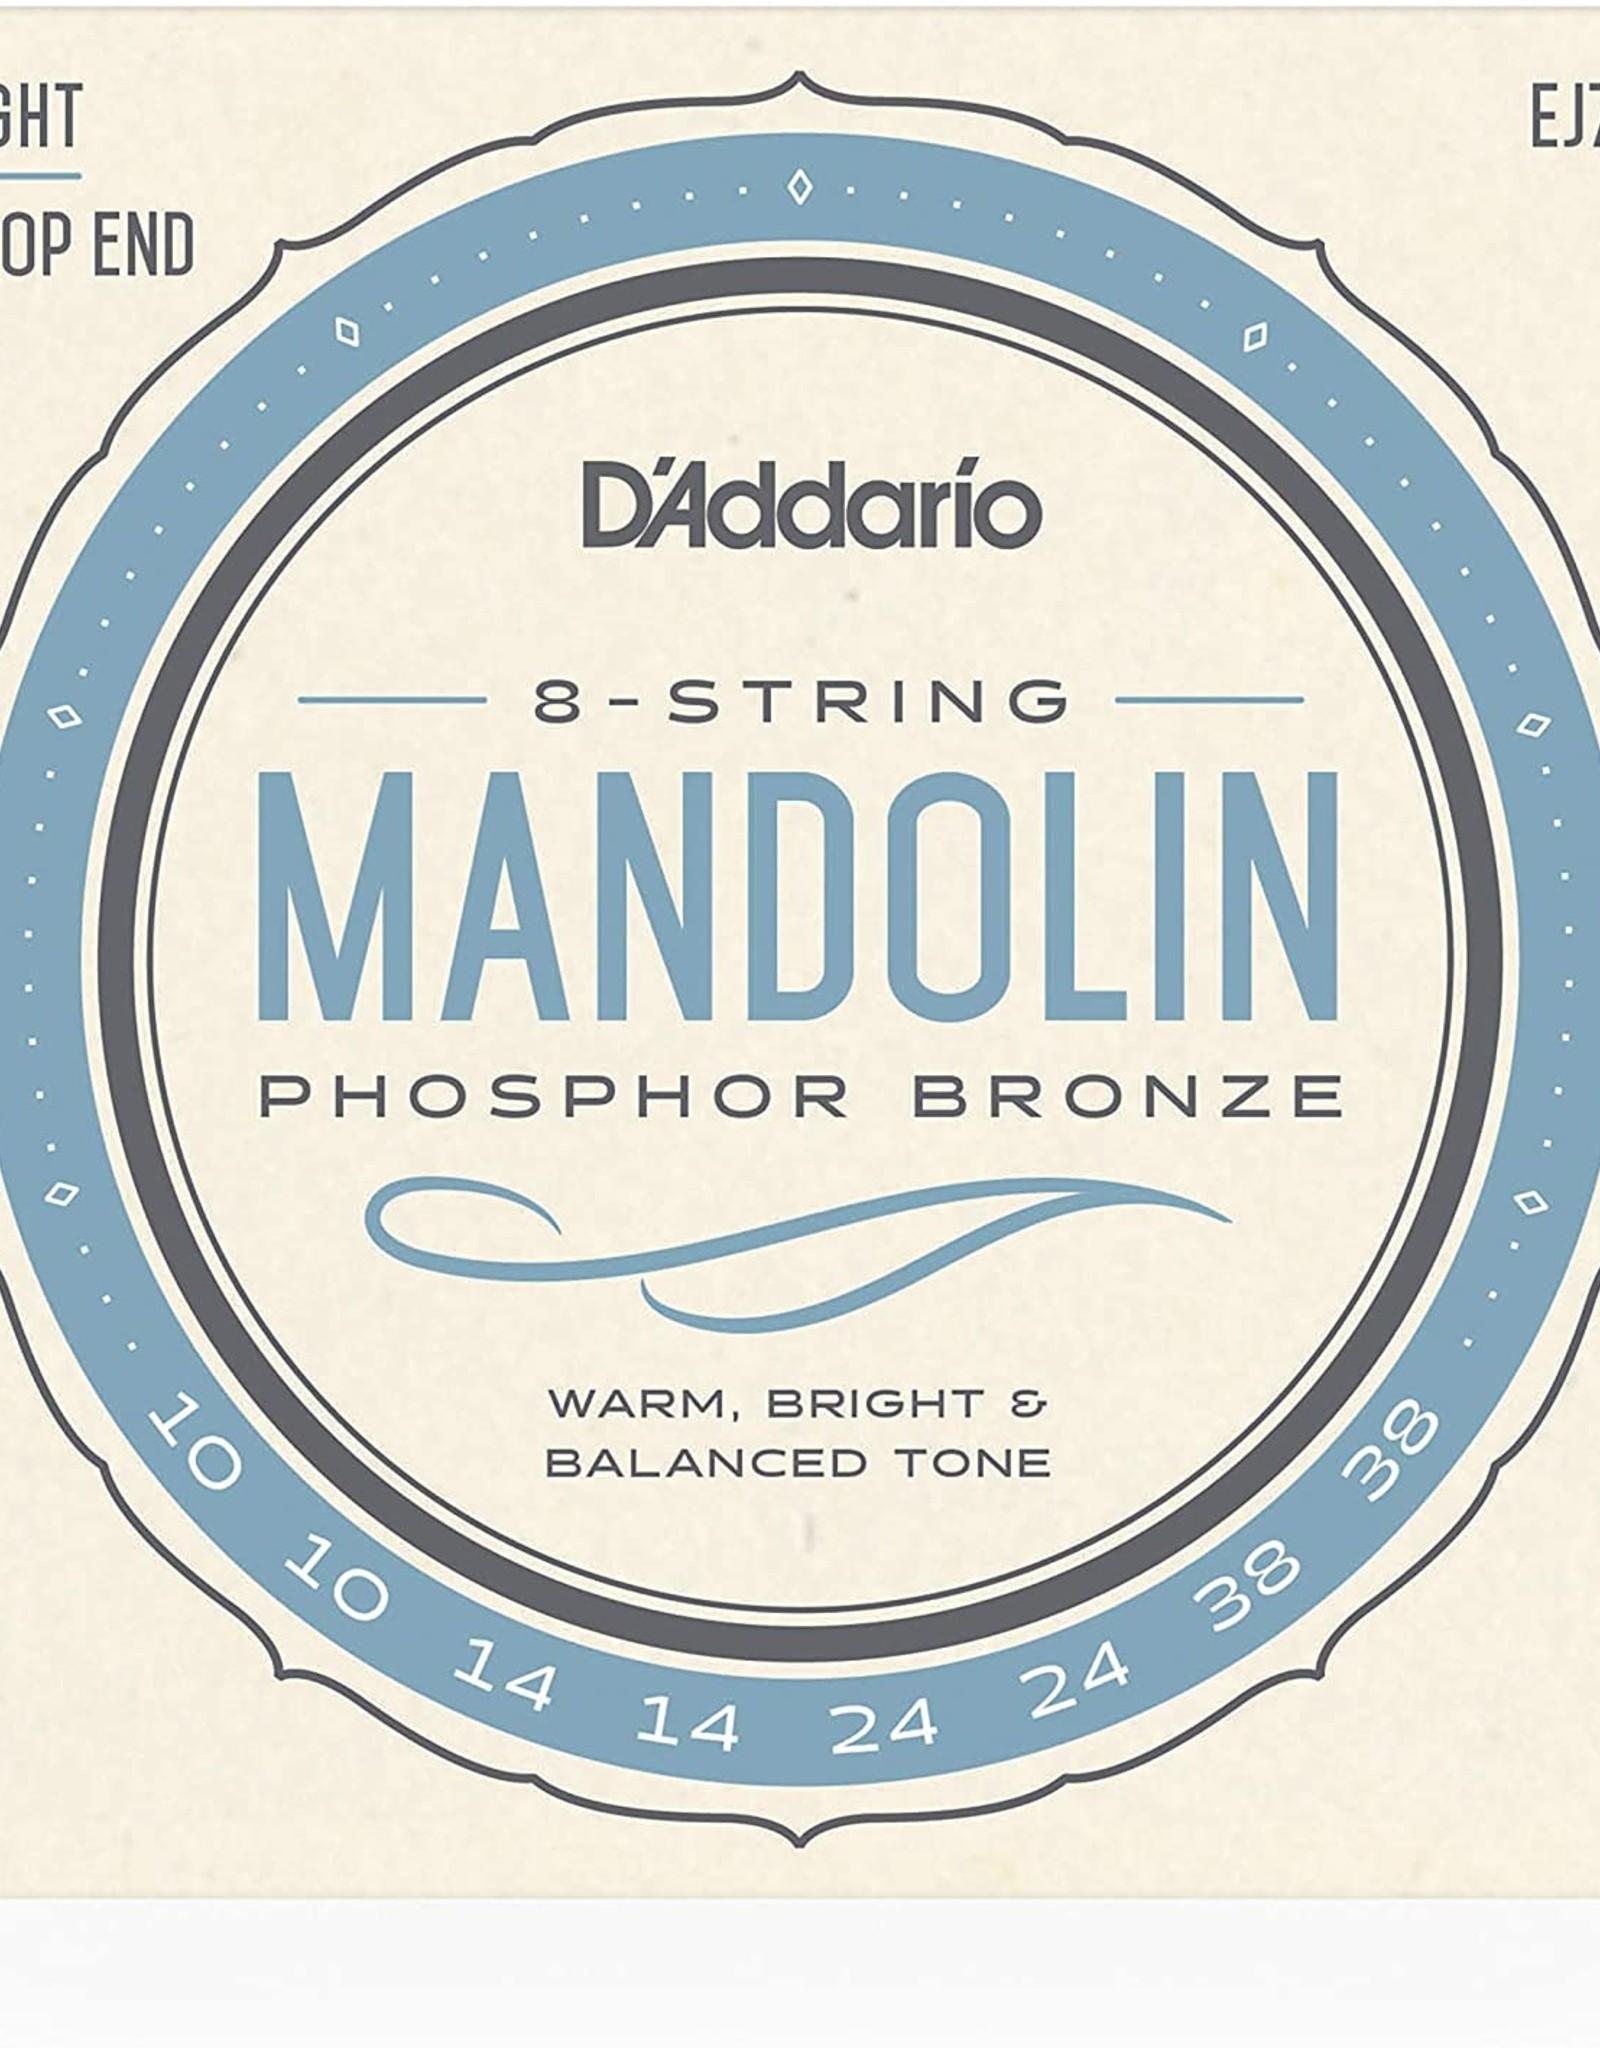 D'Addario D'Addario EJ73 Phosphor Bronze Light Mandolin strings 10-38